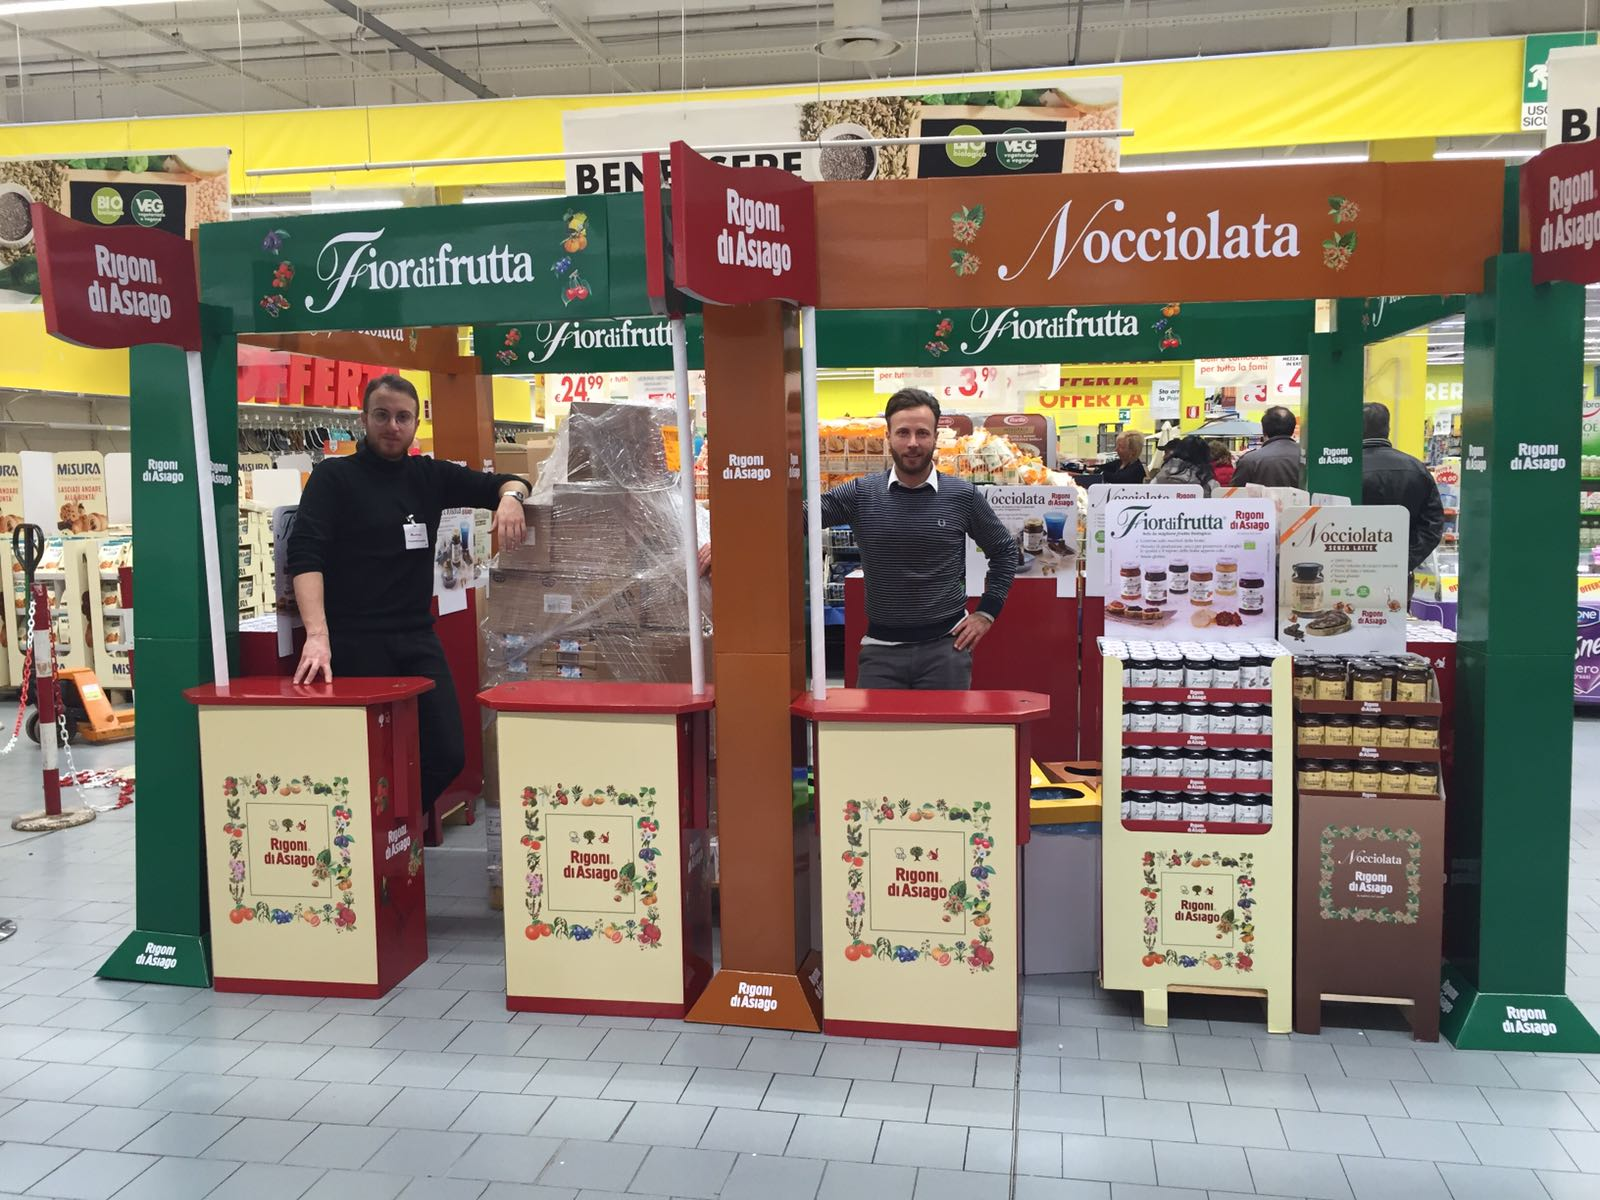 Degustazioni Rigoni di Asiago in Campania